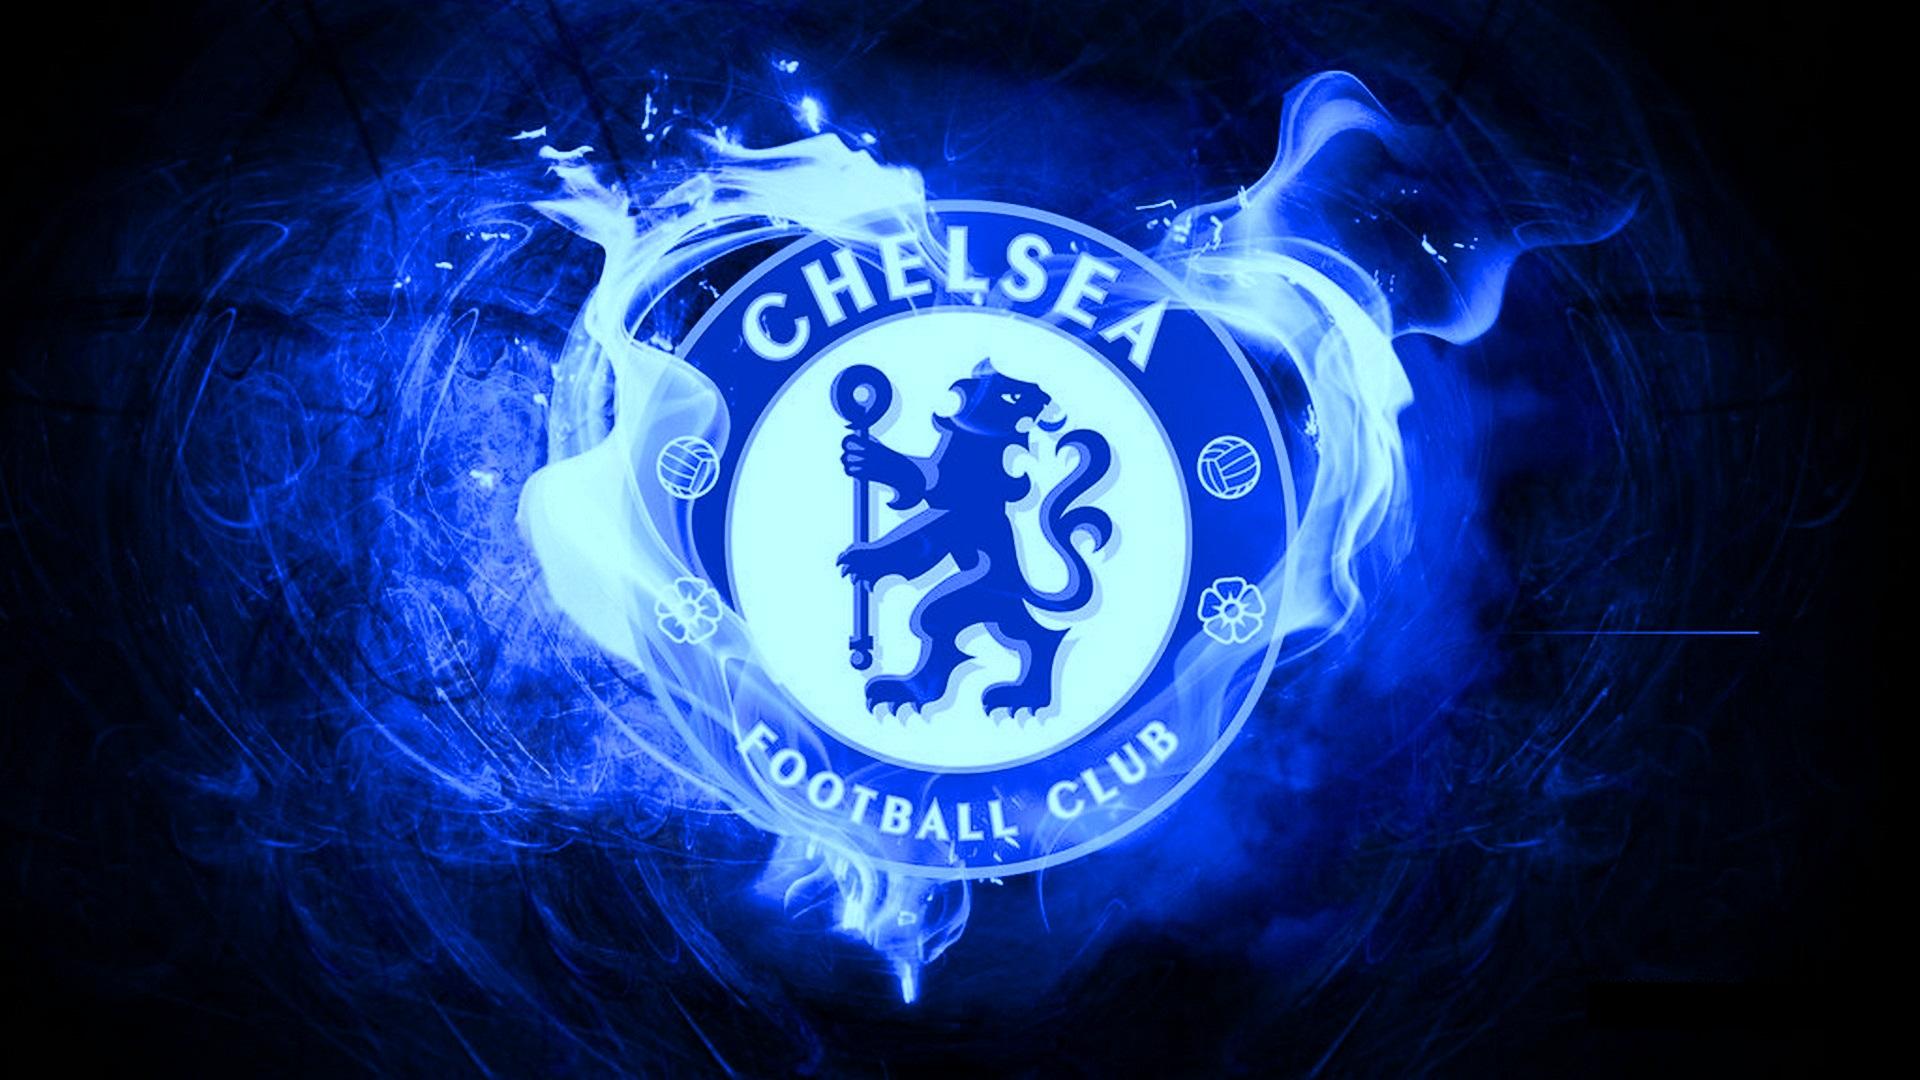 Hd Desktop Wallpaper Chelsea Fc 2020 Football Wallpaper